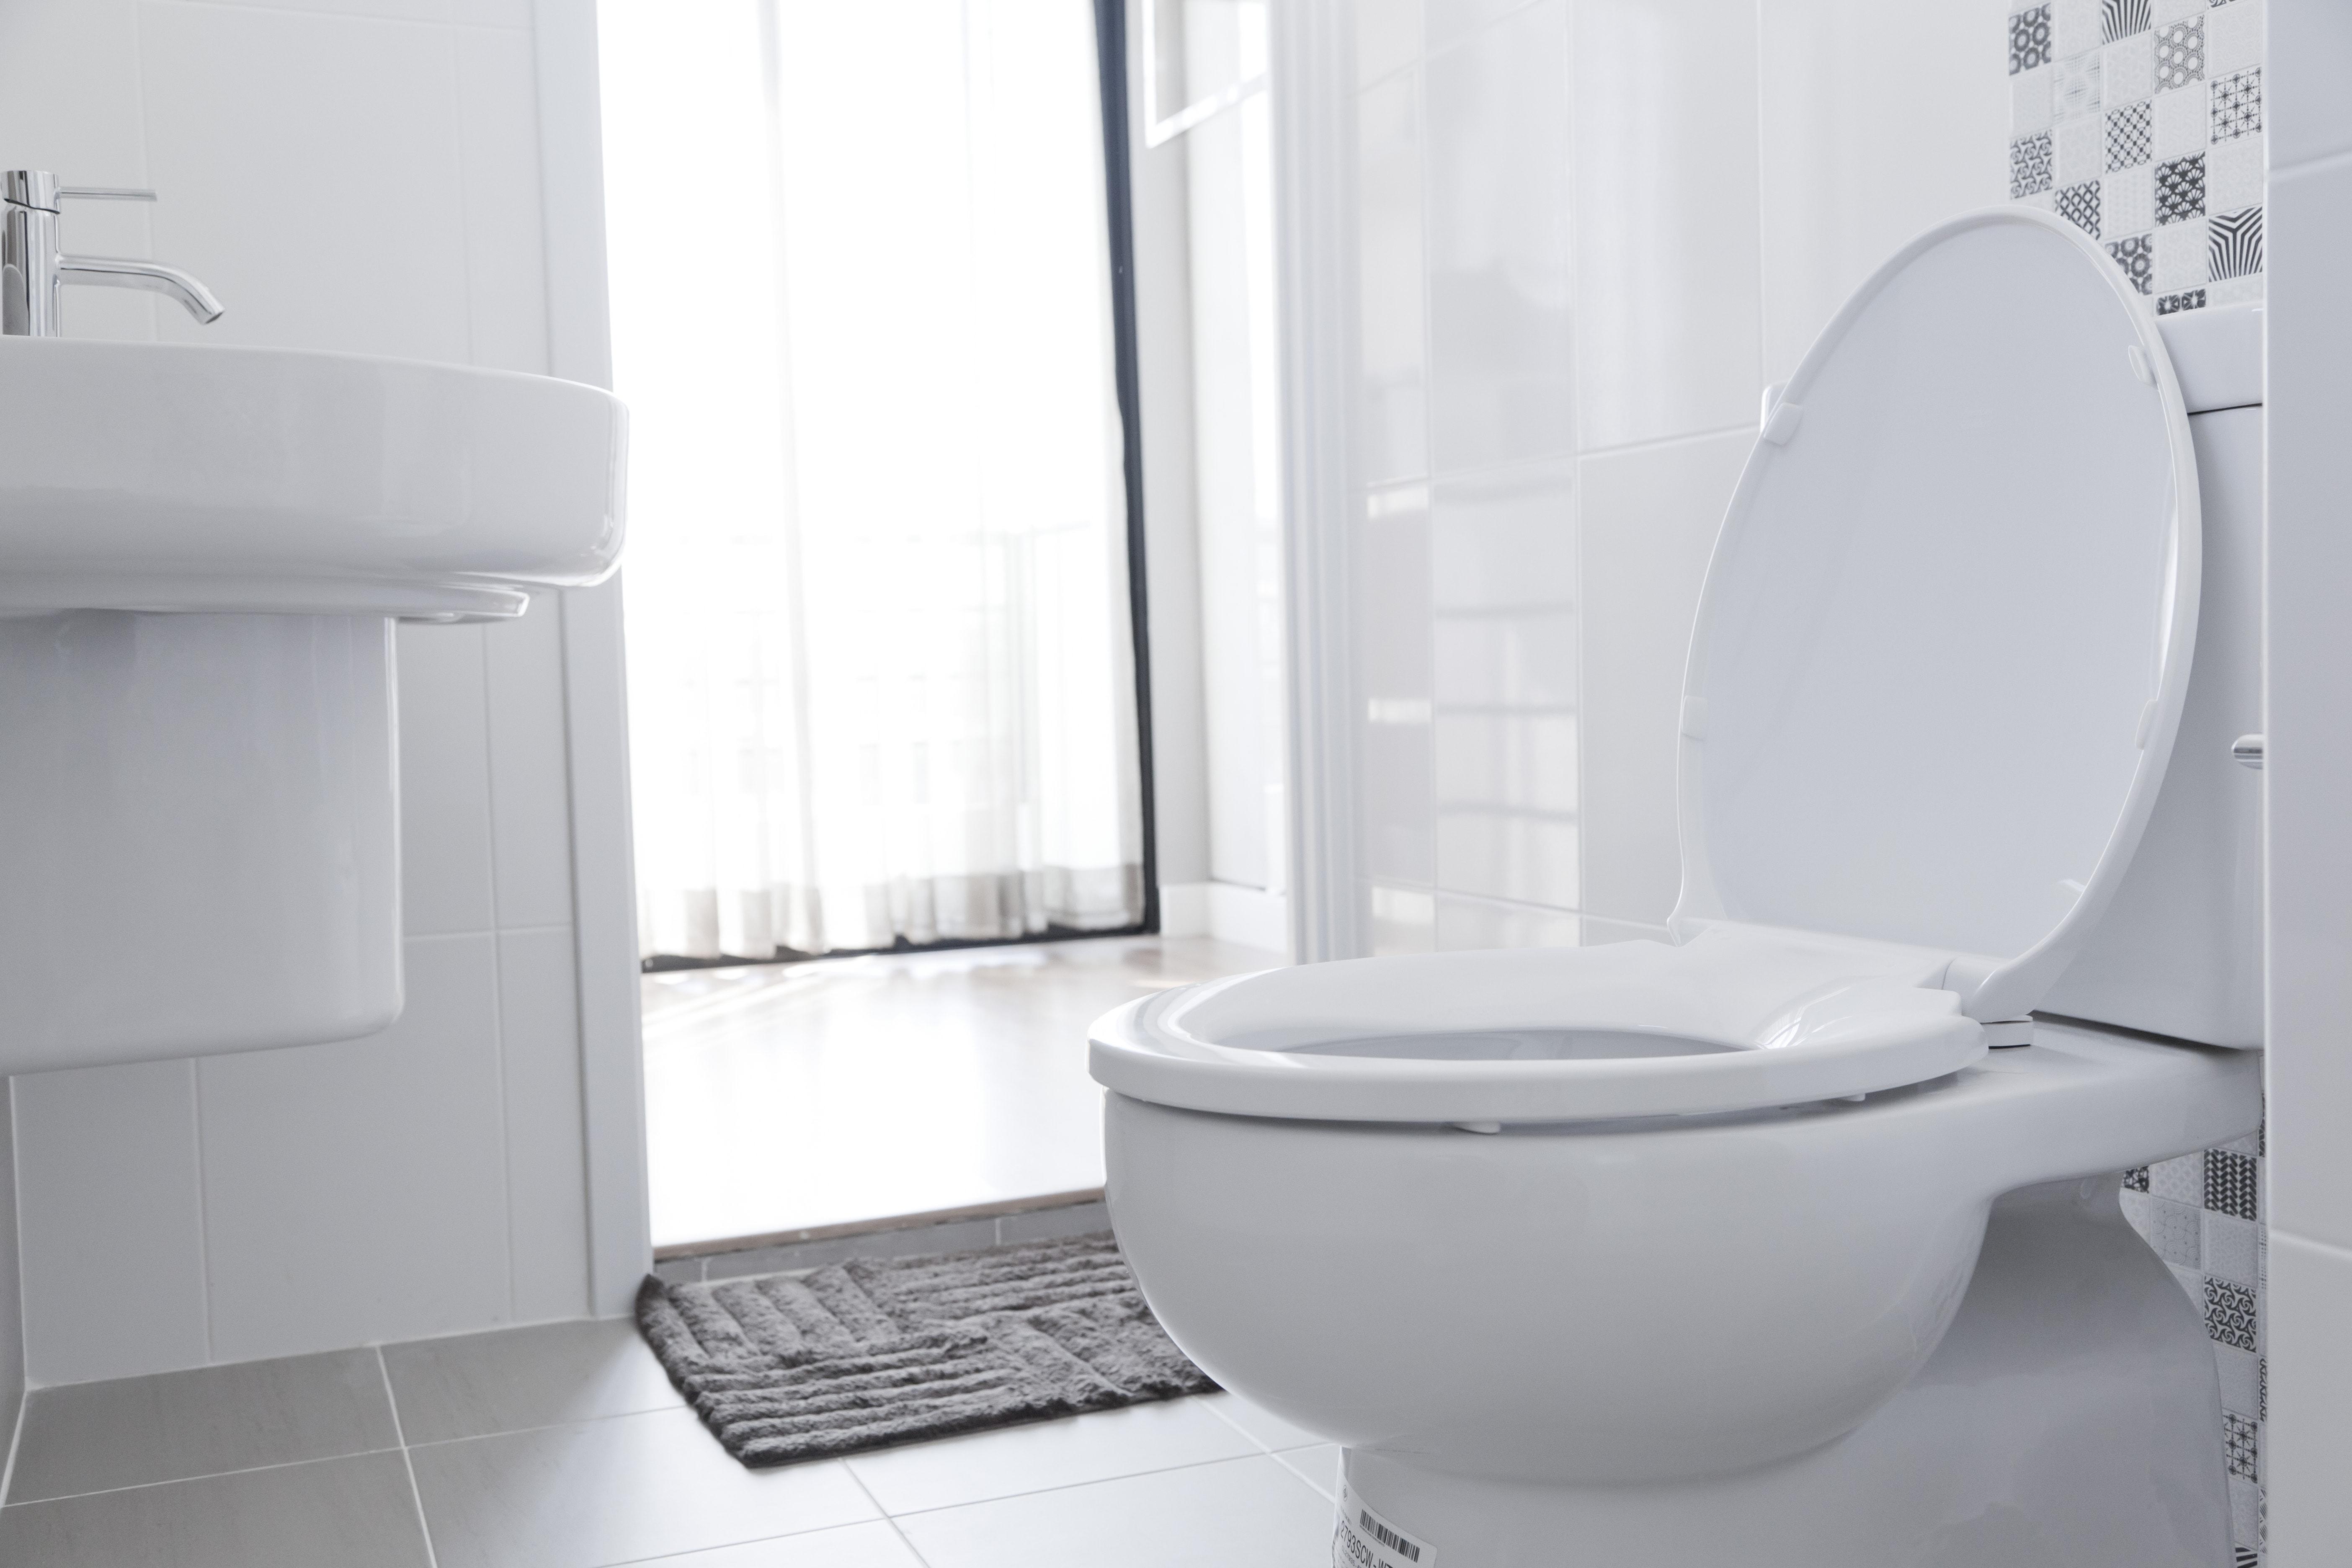 White toilet in home bathroom